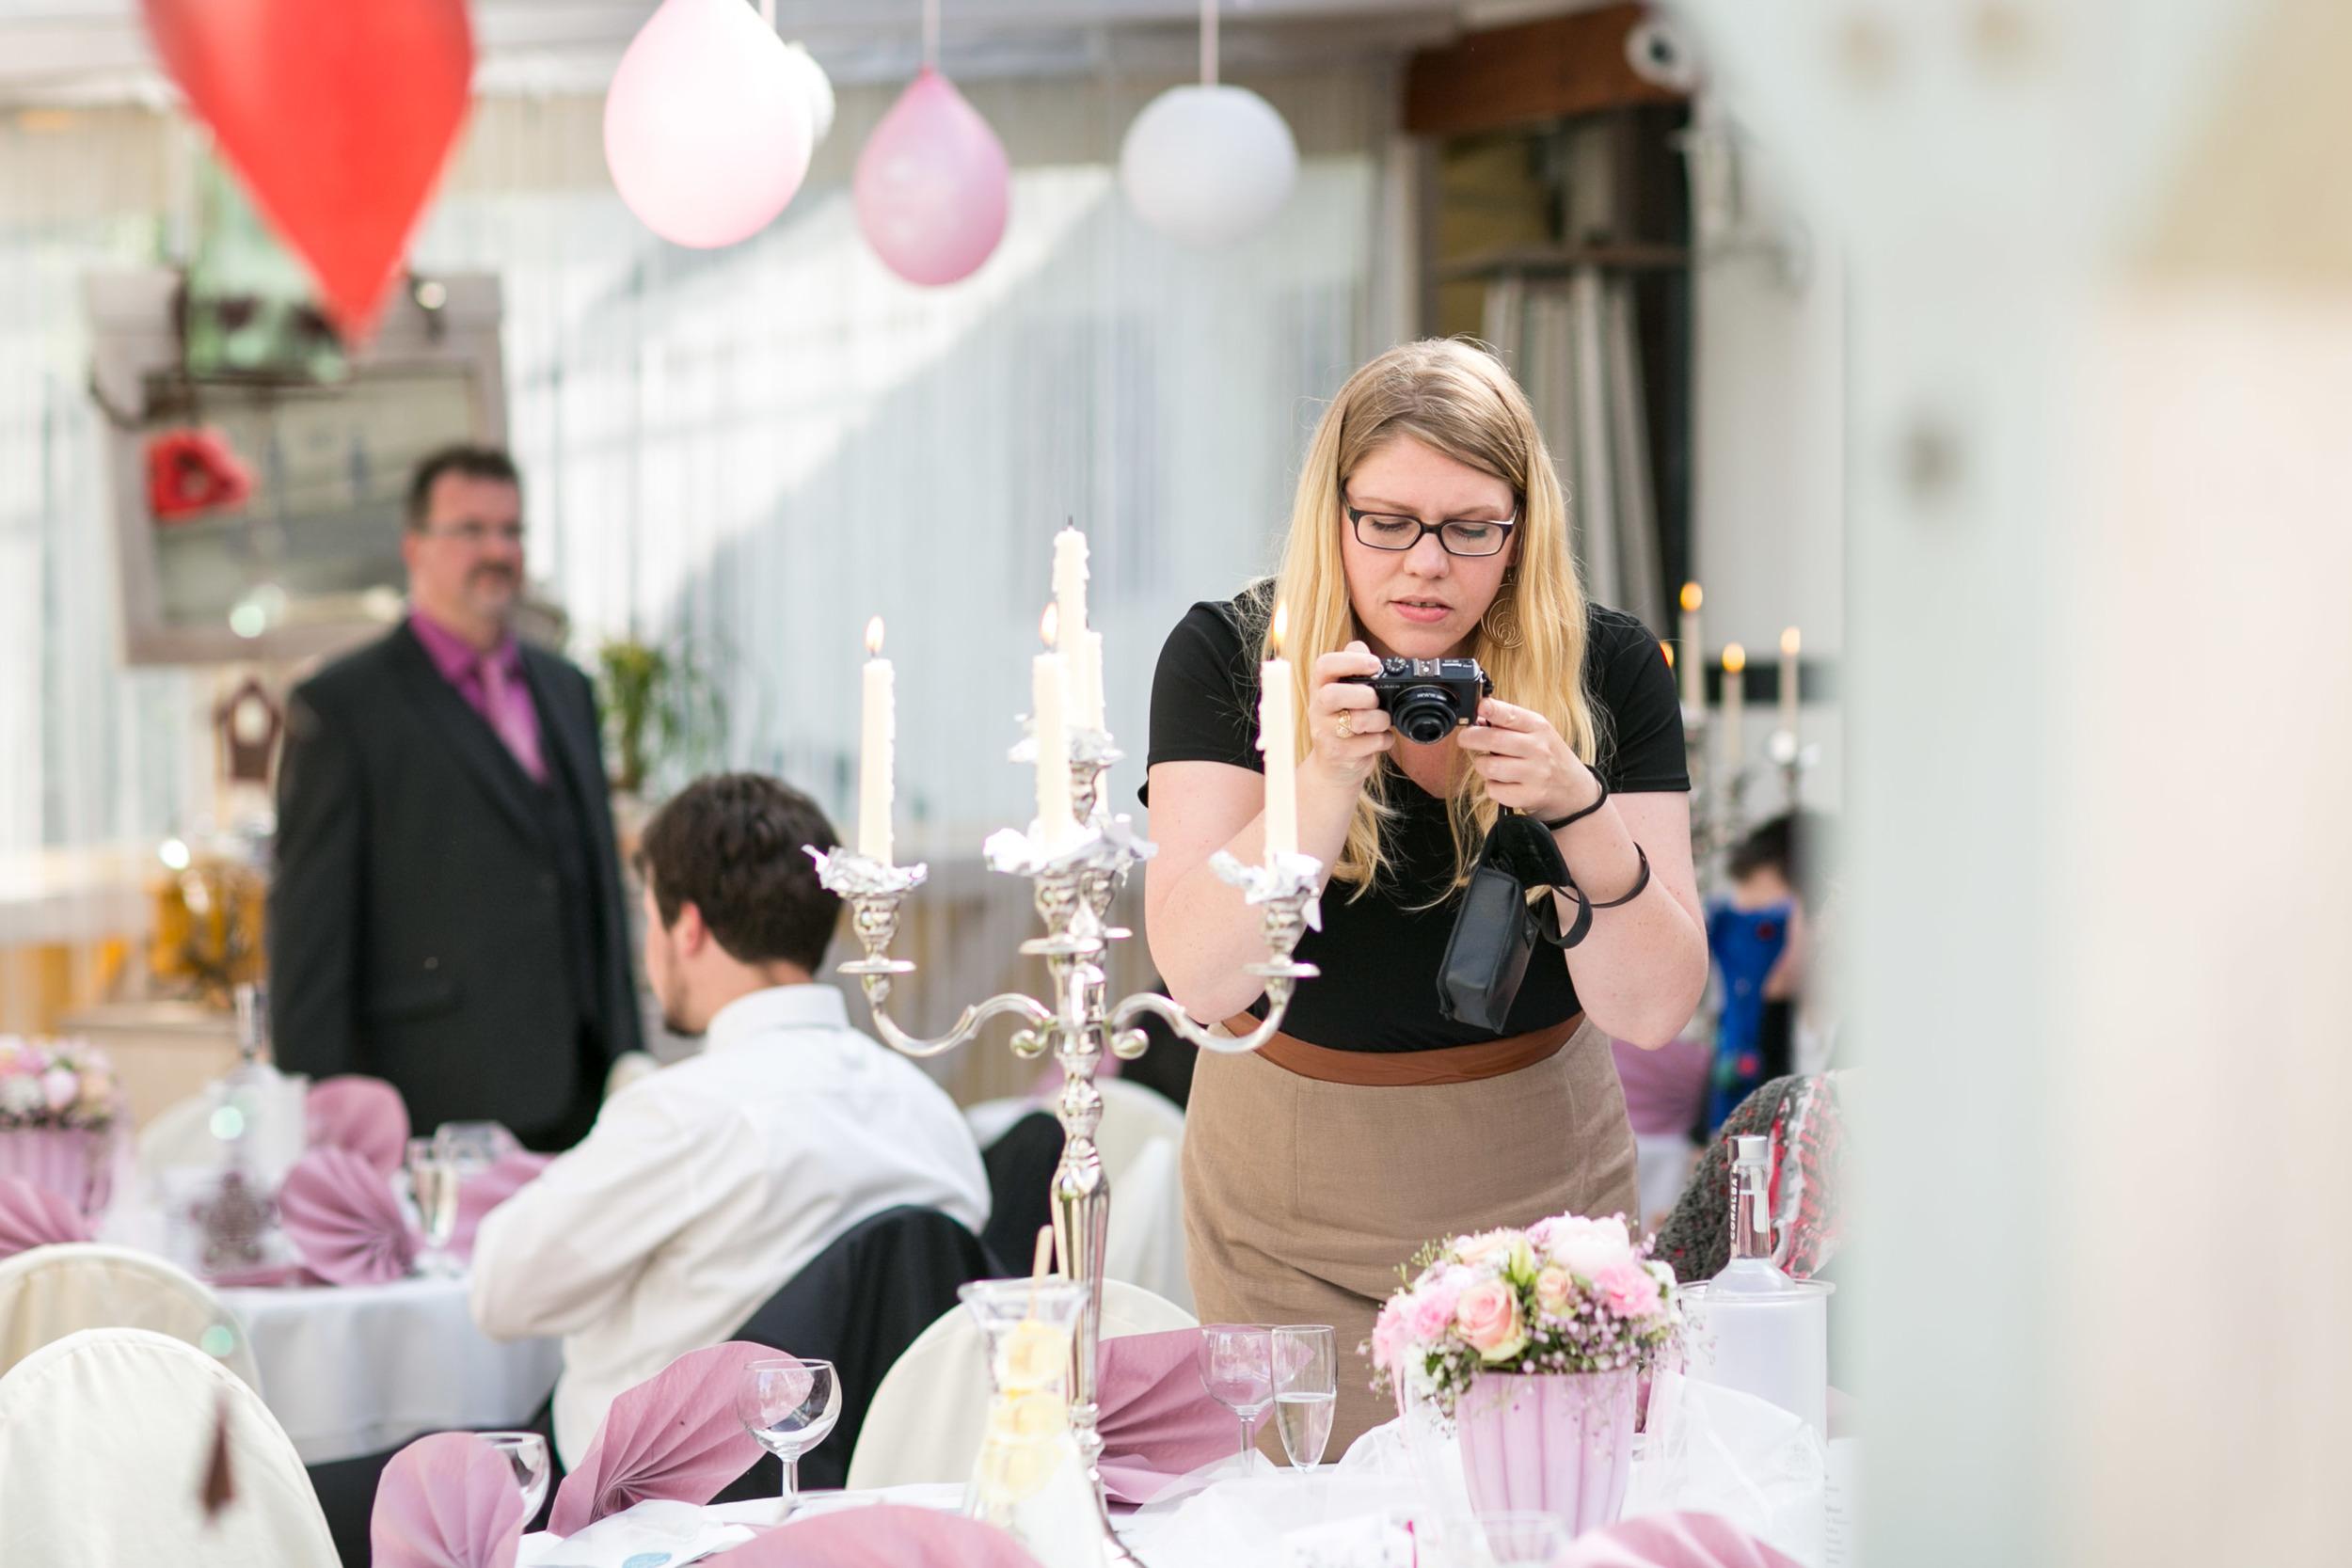 Berlin Hochzeitsfotografie_Fran Burrows-492.jpg